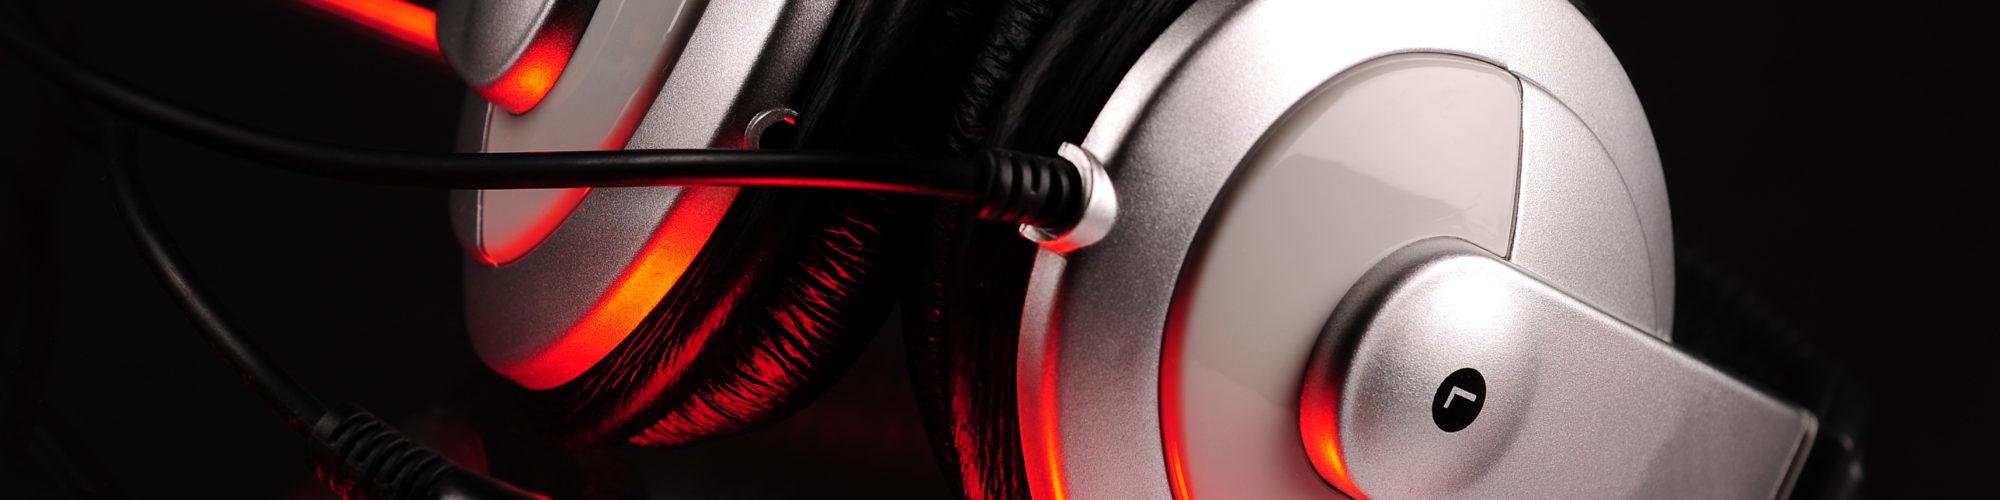 534470-headphones